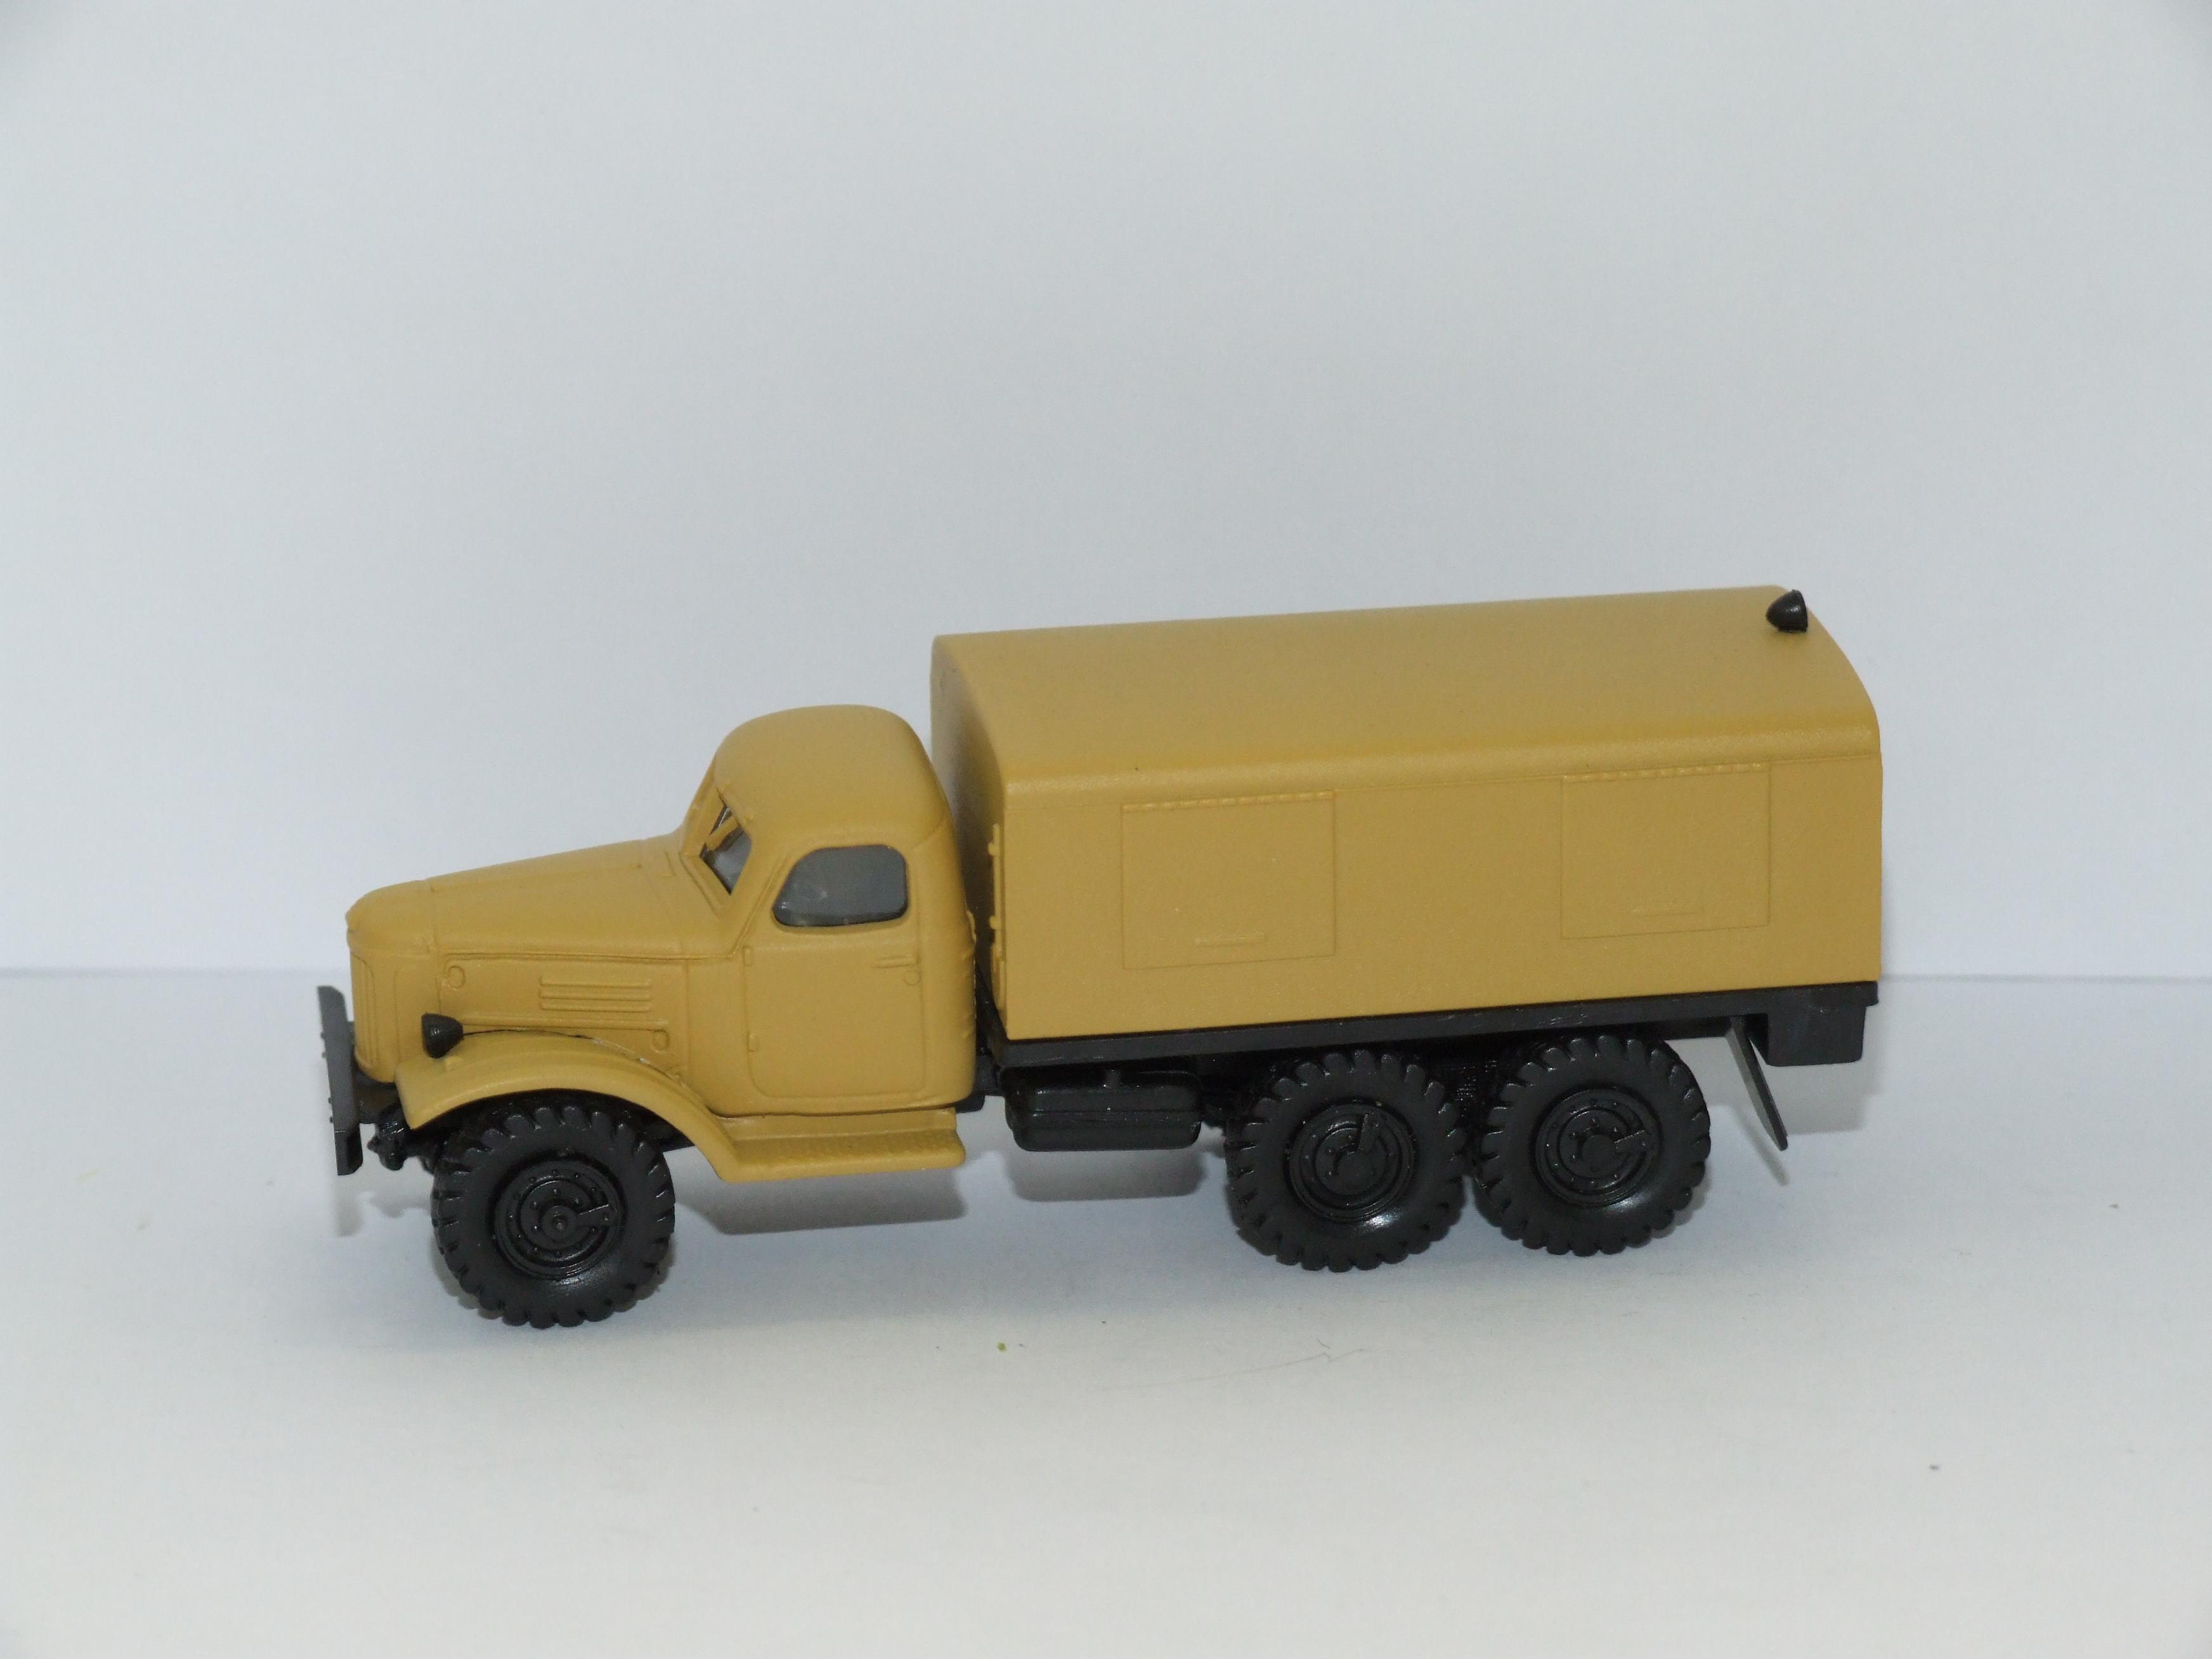 Herpa H0 1:87 Roco Minitanks 744522 ZIL 157 Koffer-LKW desert sandbeige